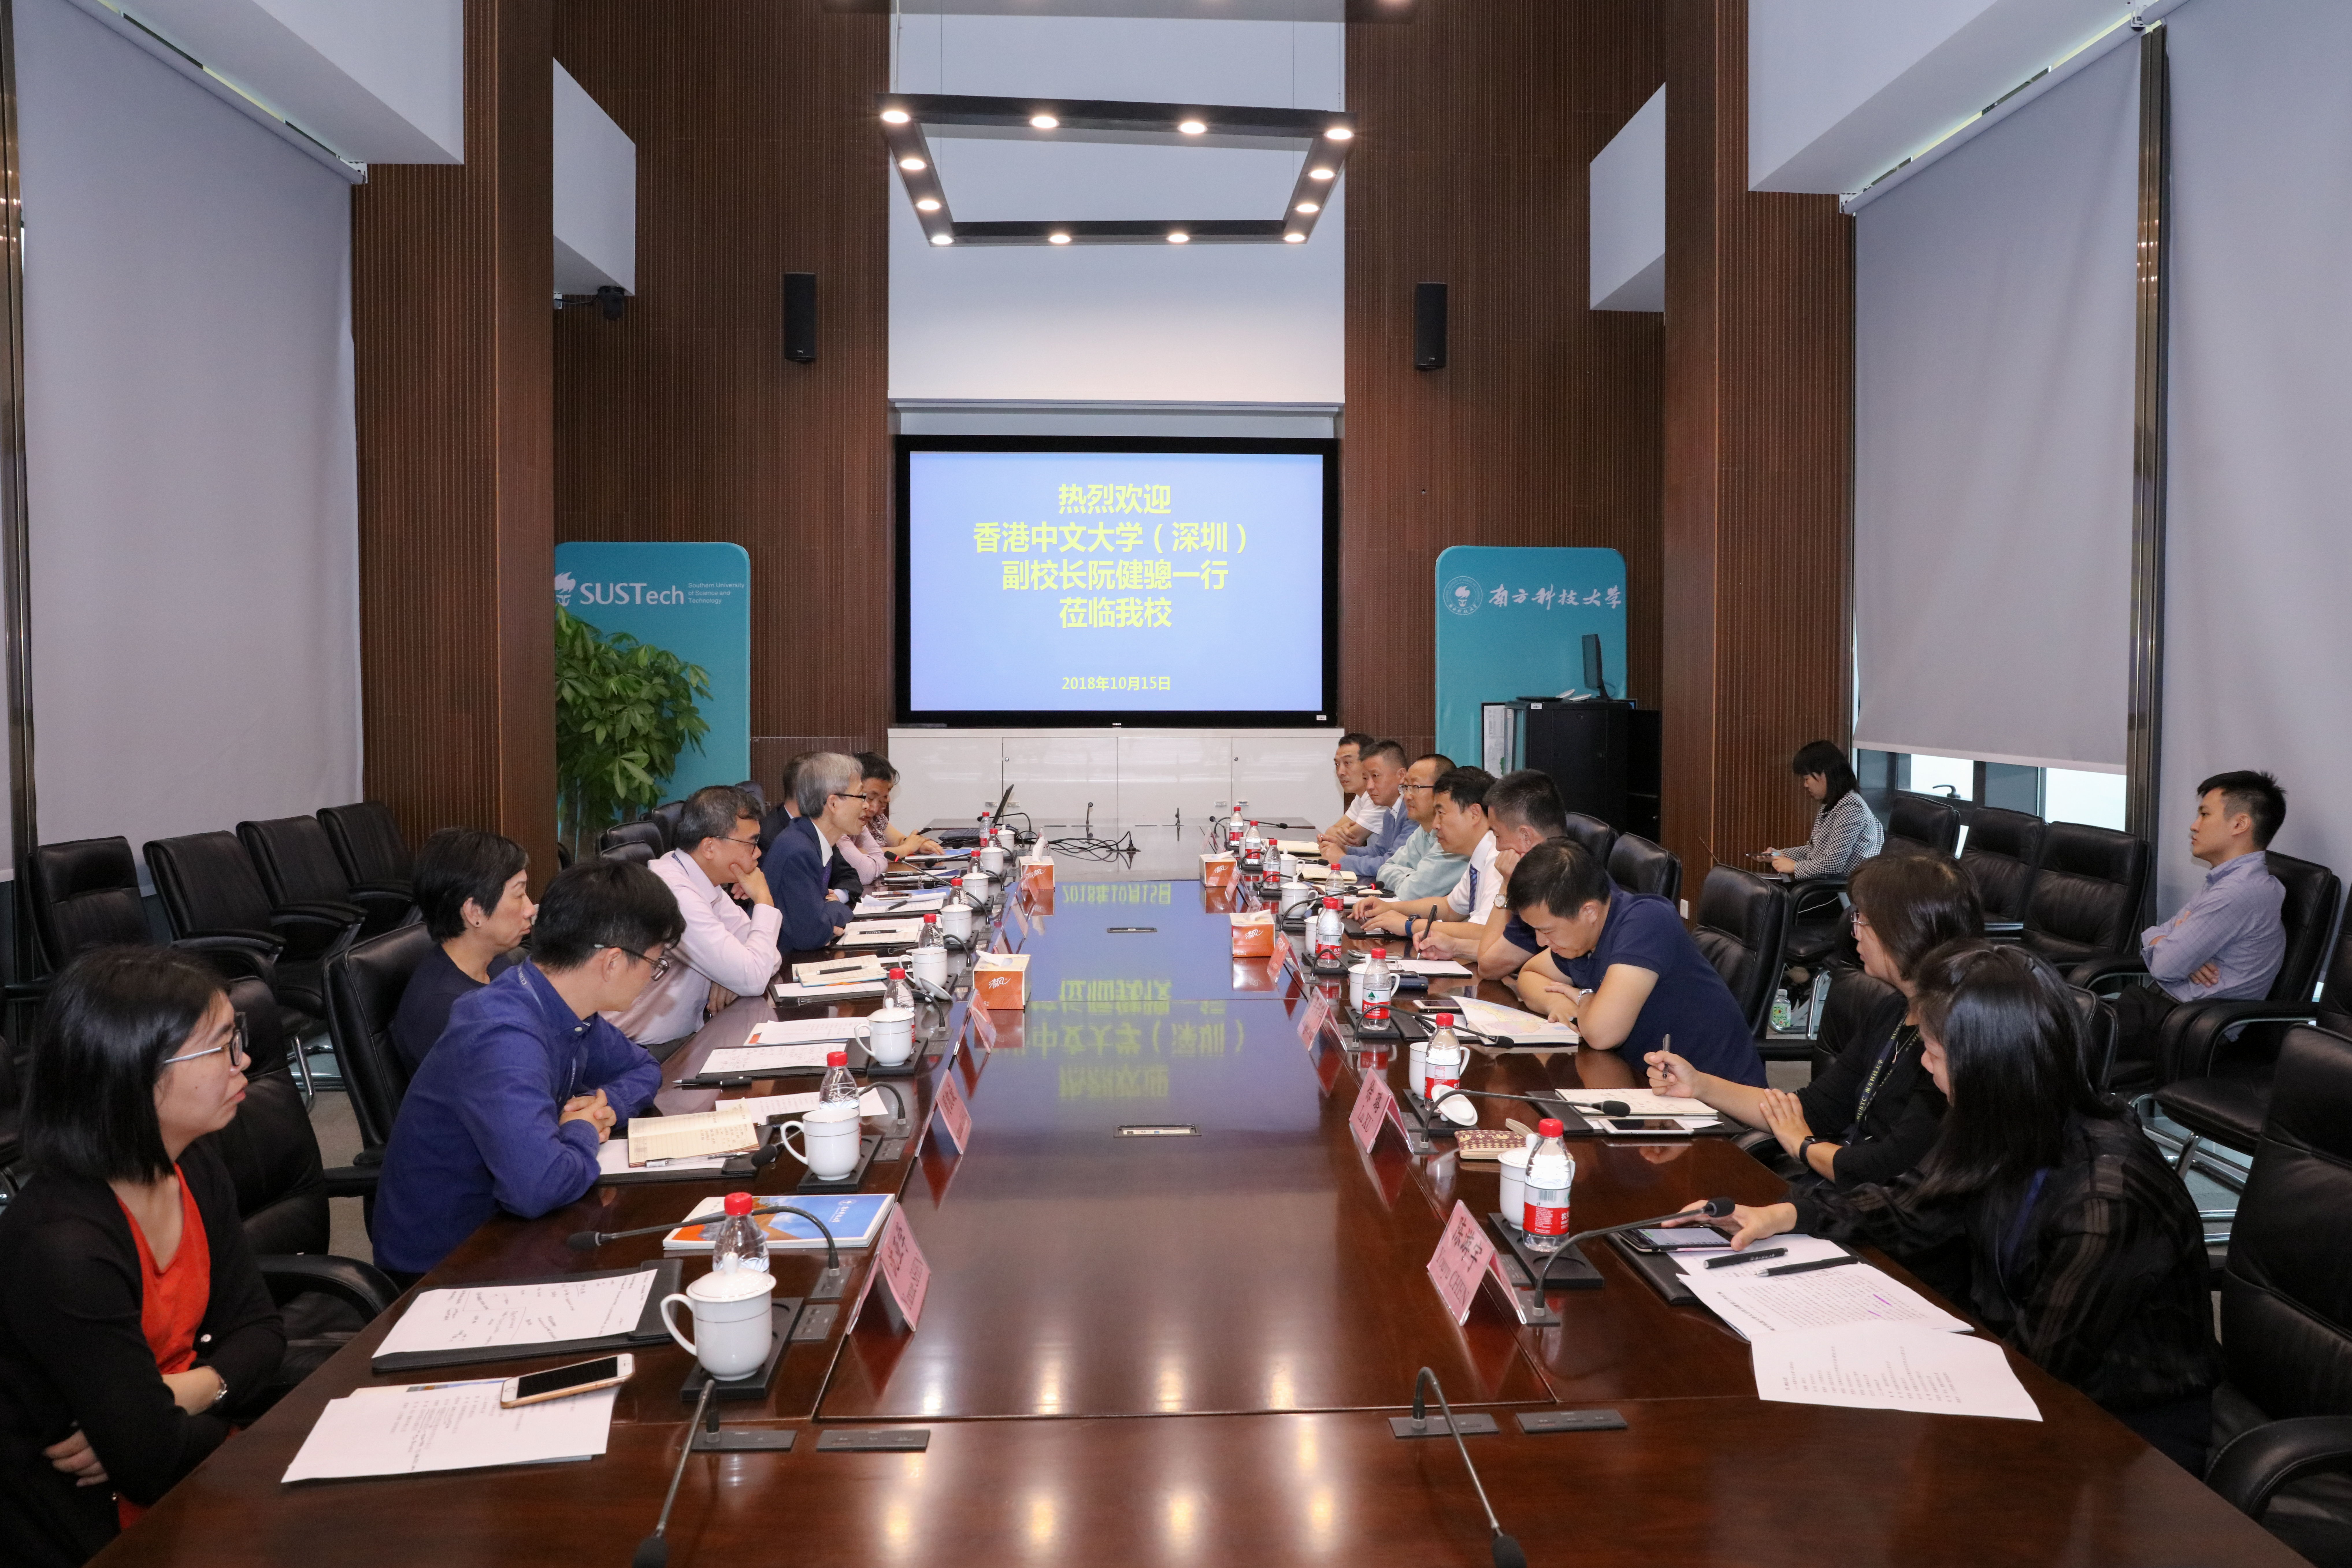 Vice President of CUHK-Shenzhen Visits SUSTech